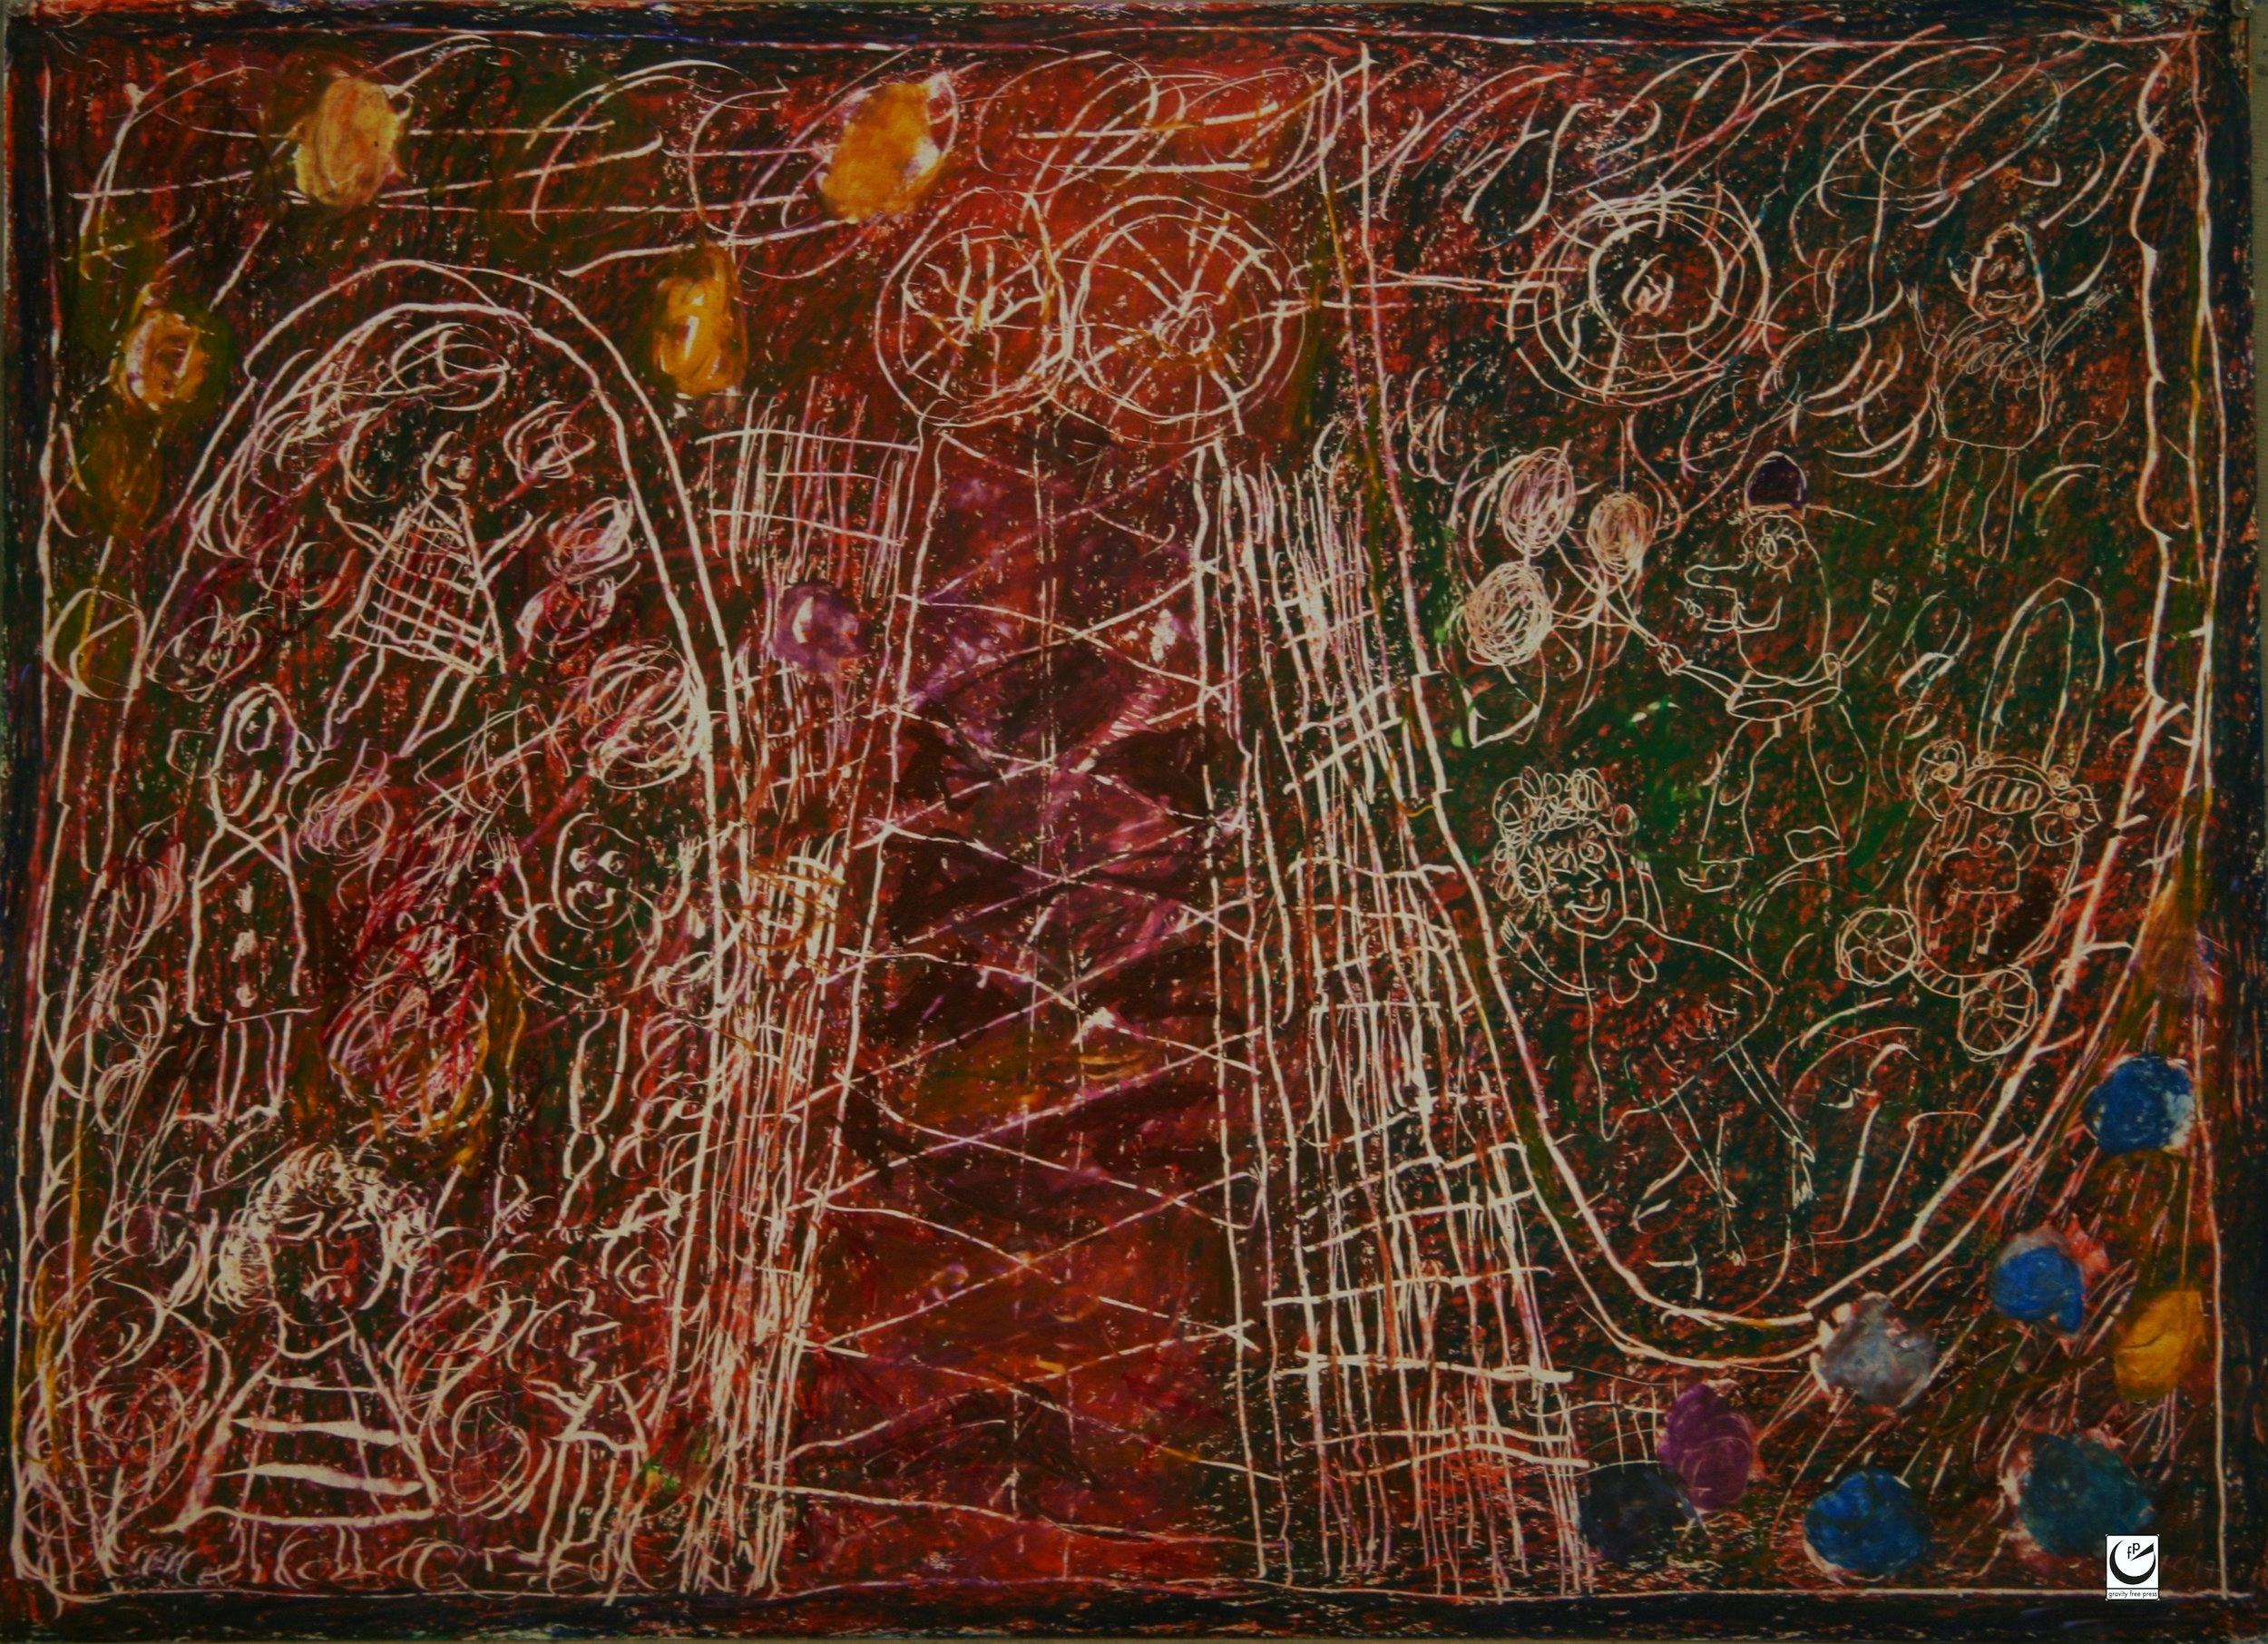 Luna Park Series, wax crayon on paper, 2017